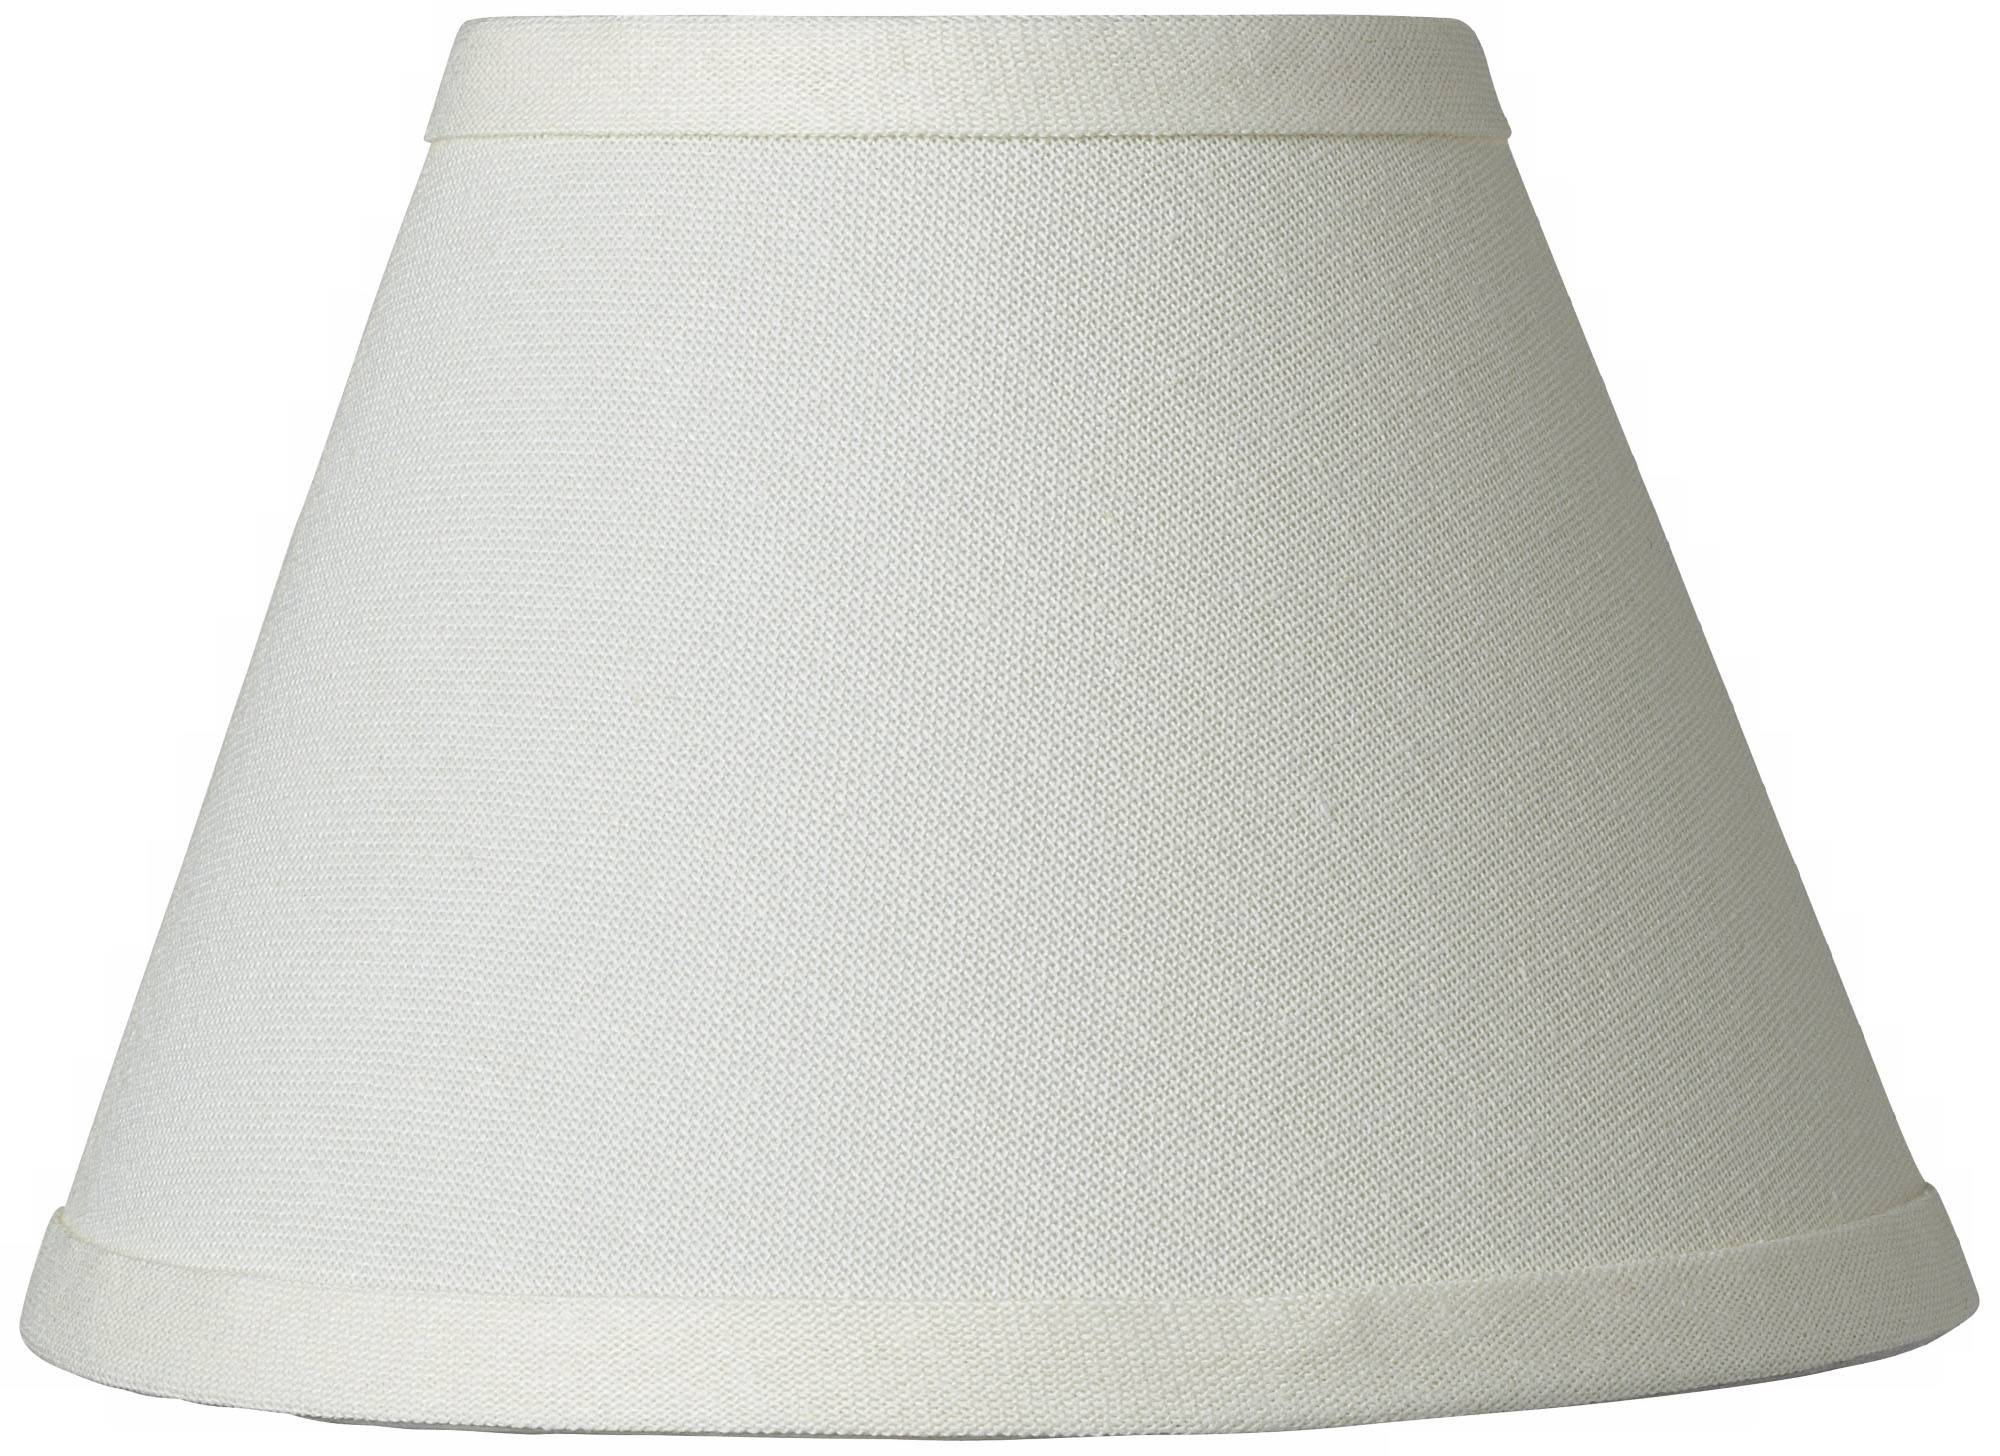 Cream chandelier lamp shade 3 5x7x5 clip on